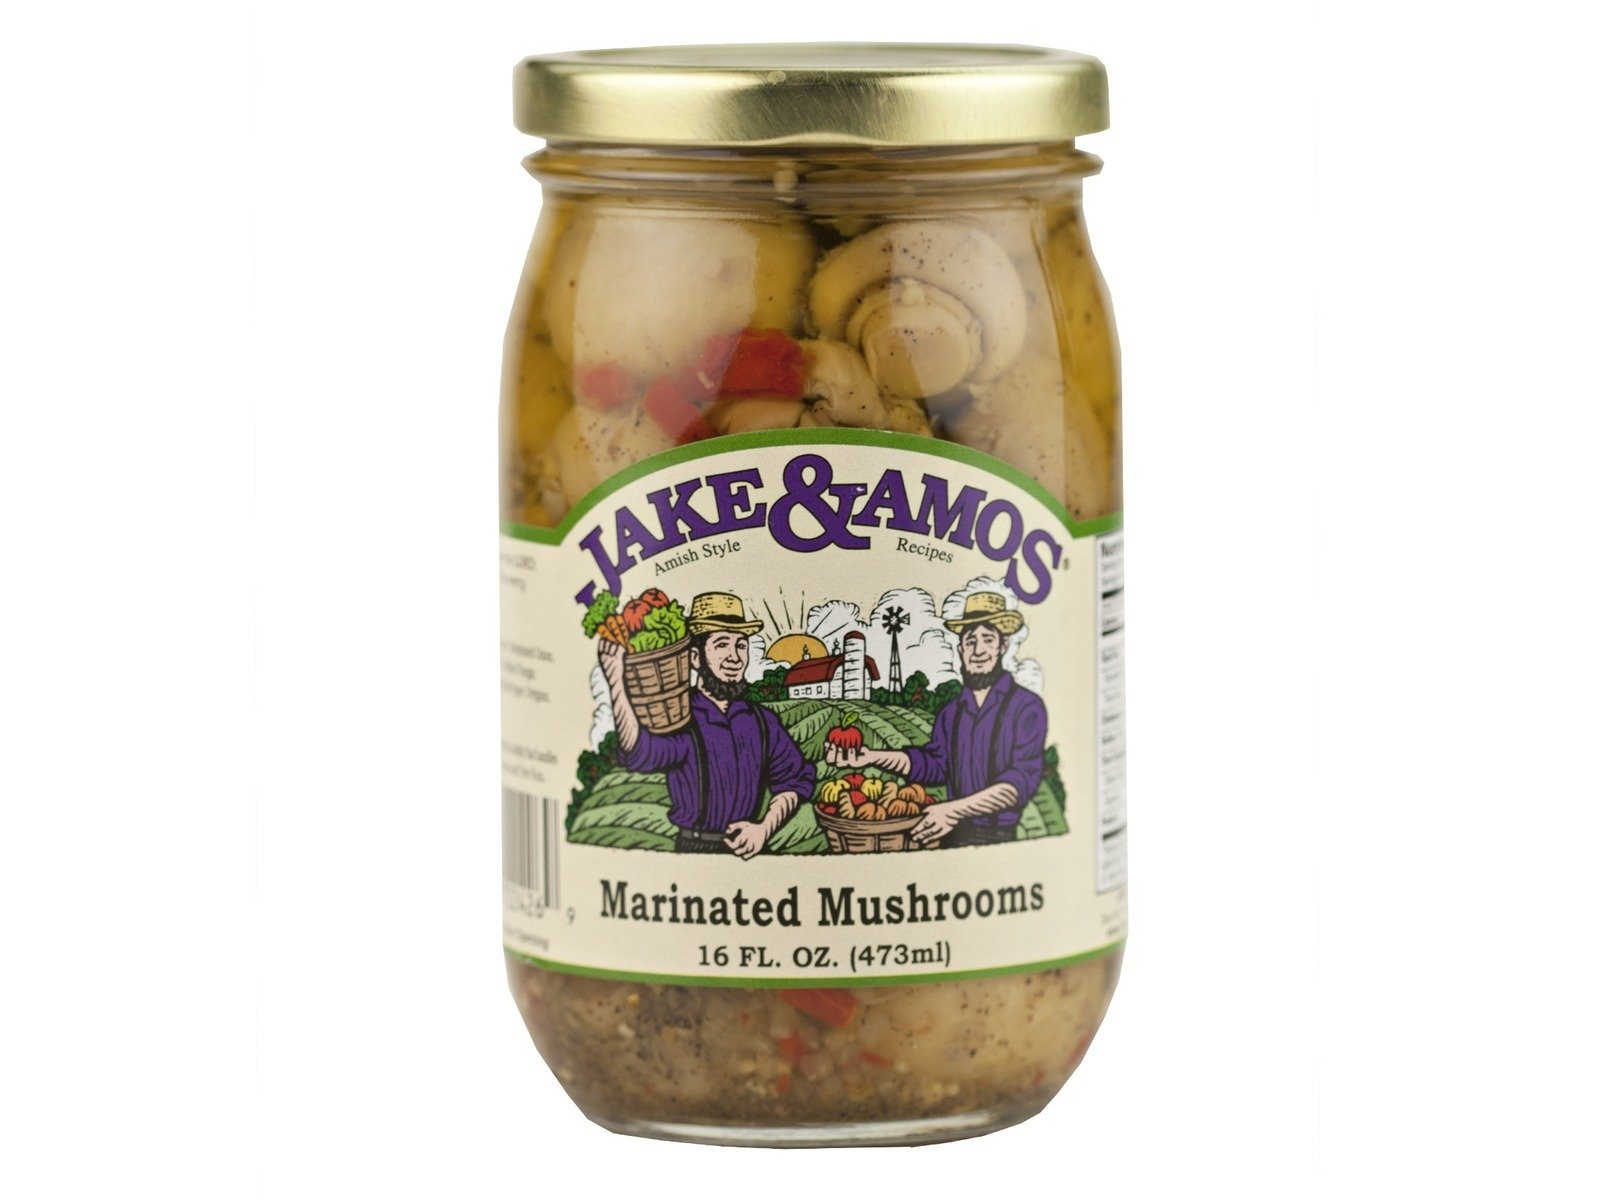 Jake & Amos Marinated Mushrooms, 16 Ounce - 3 Pack